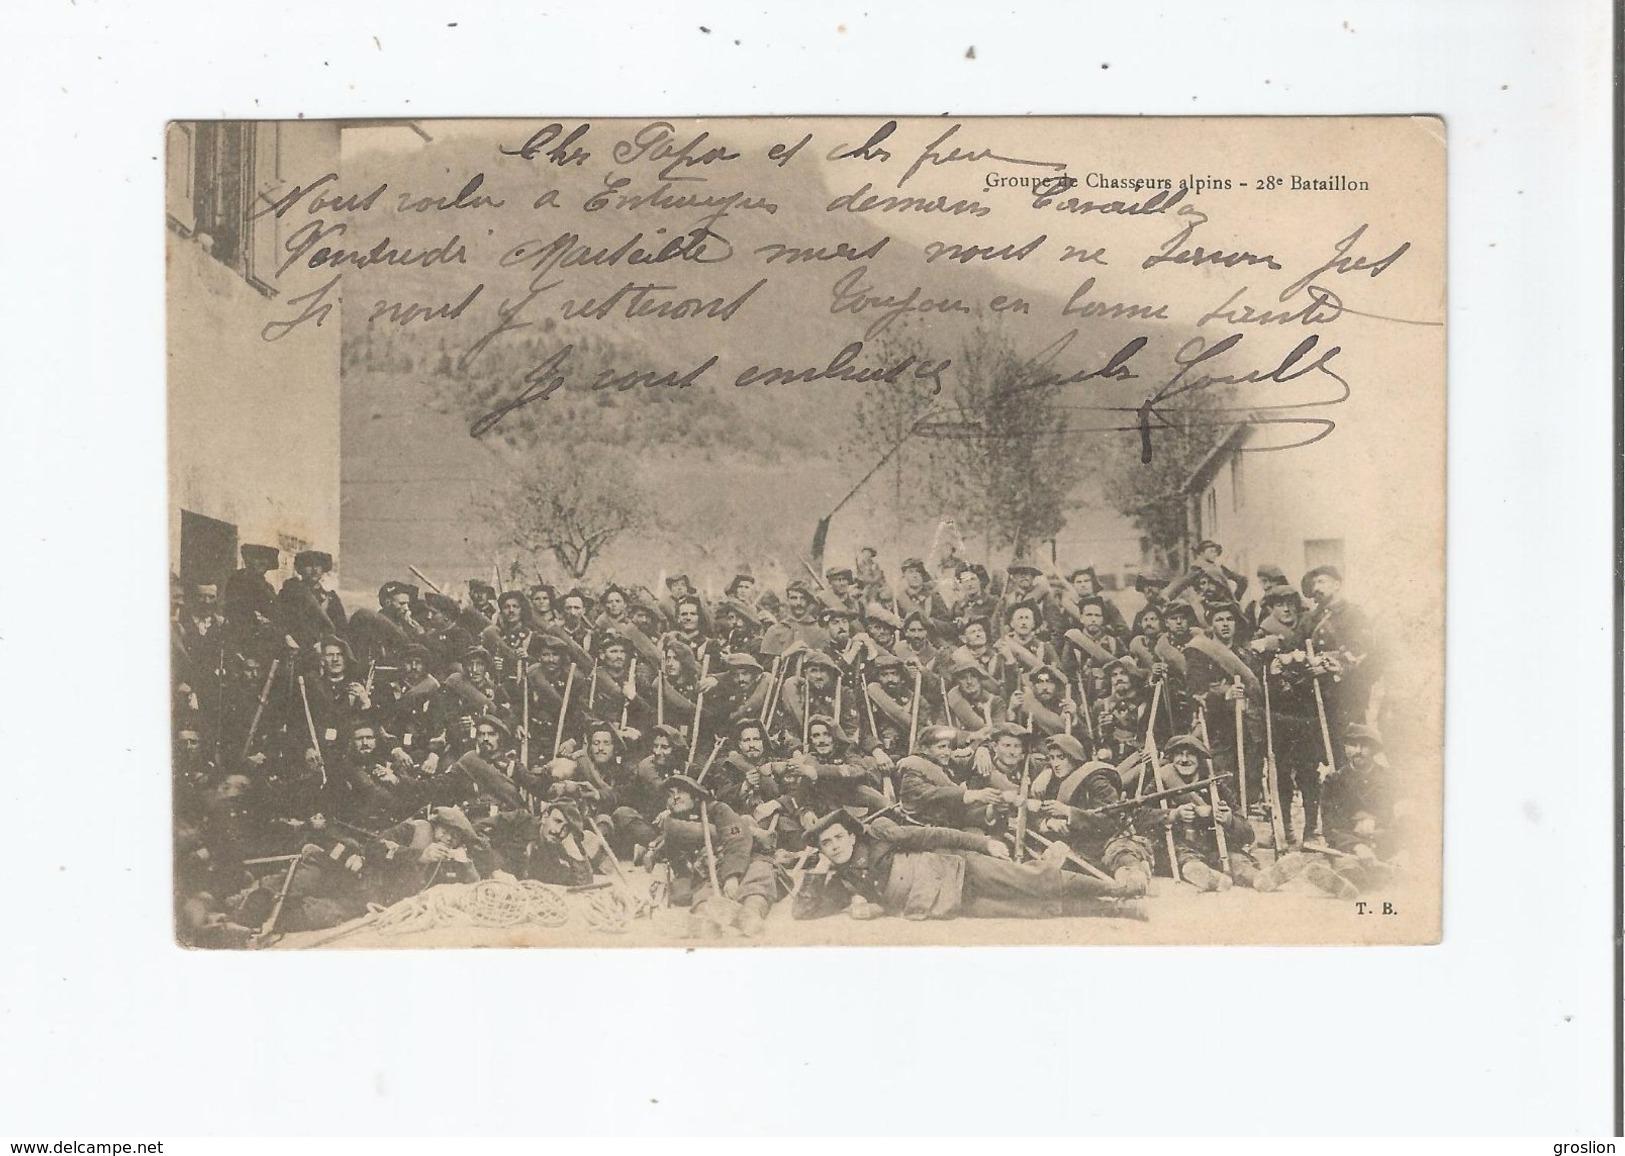 GROUPE DE CHASSEURS ALPINS . 28 EME BATAILLON (GRENOBLE ISERE) 1903 - Grenoble